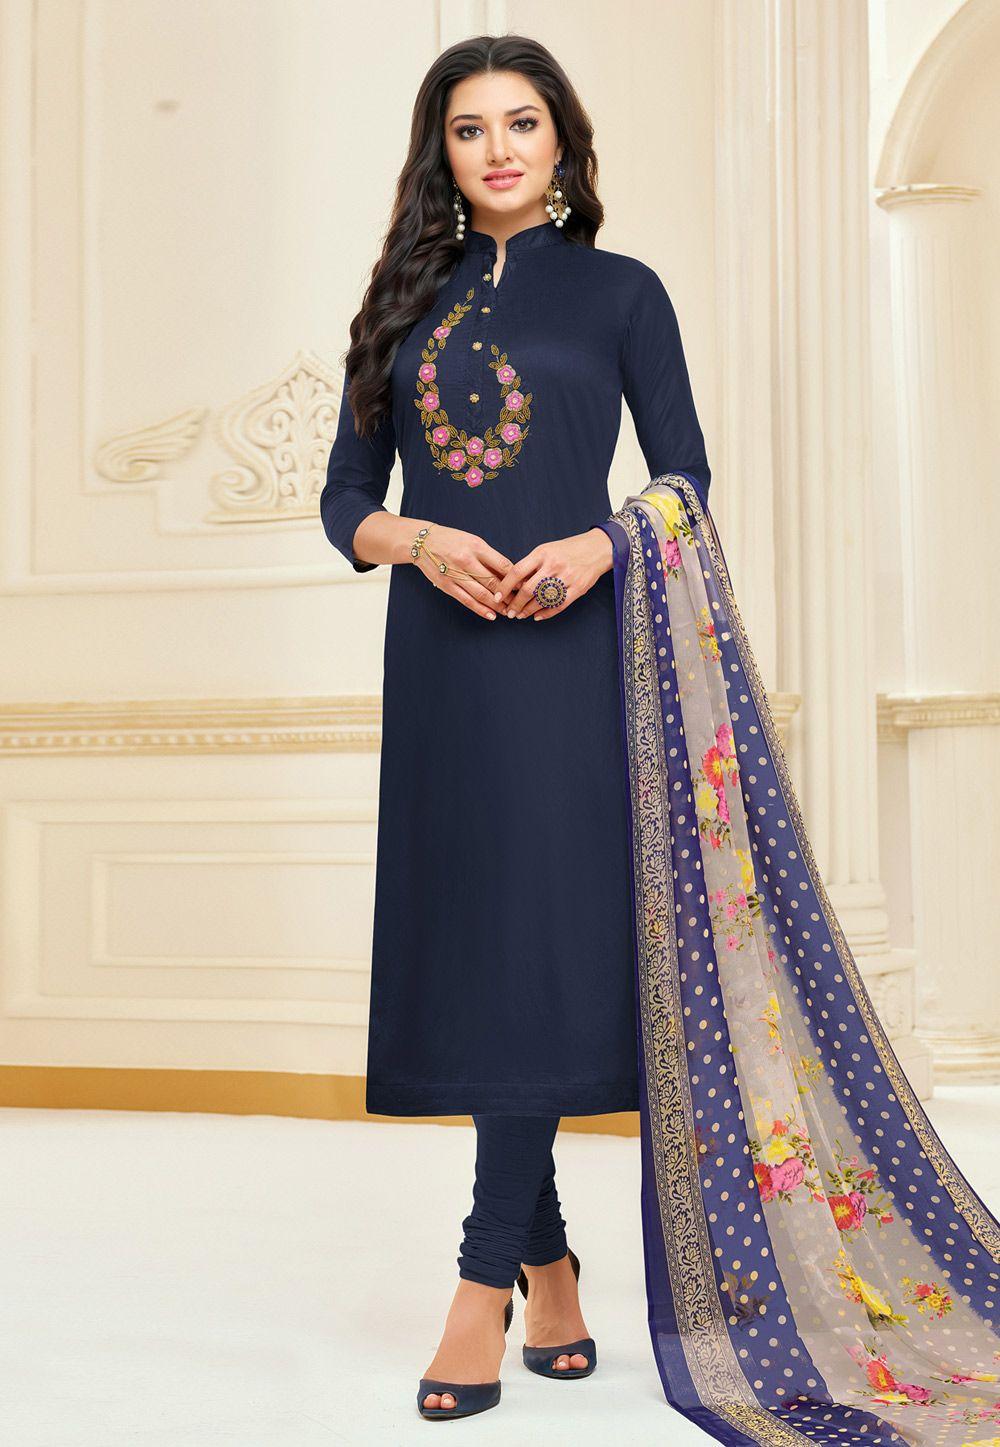 085f28d9b8 Buy Navy Blue Chanderi Churidar Salwar Kameez 166966 online at lowest price  from huge collection of